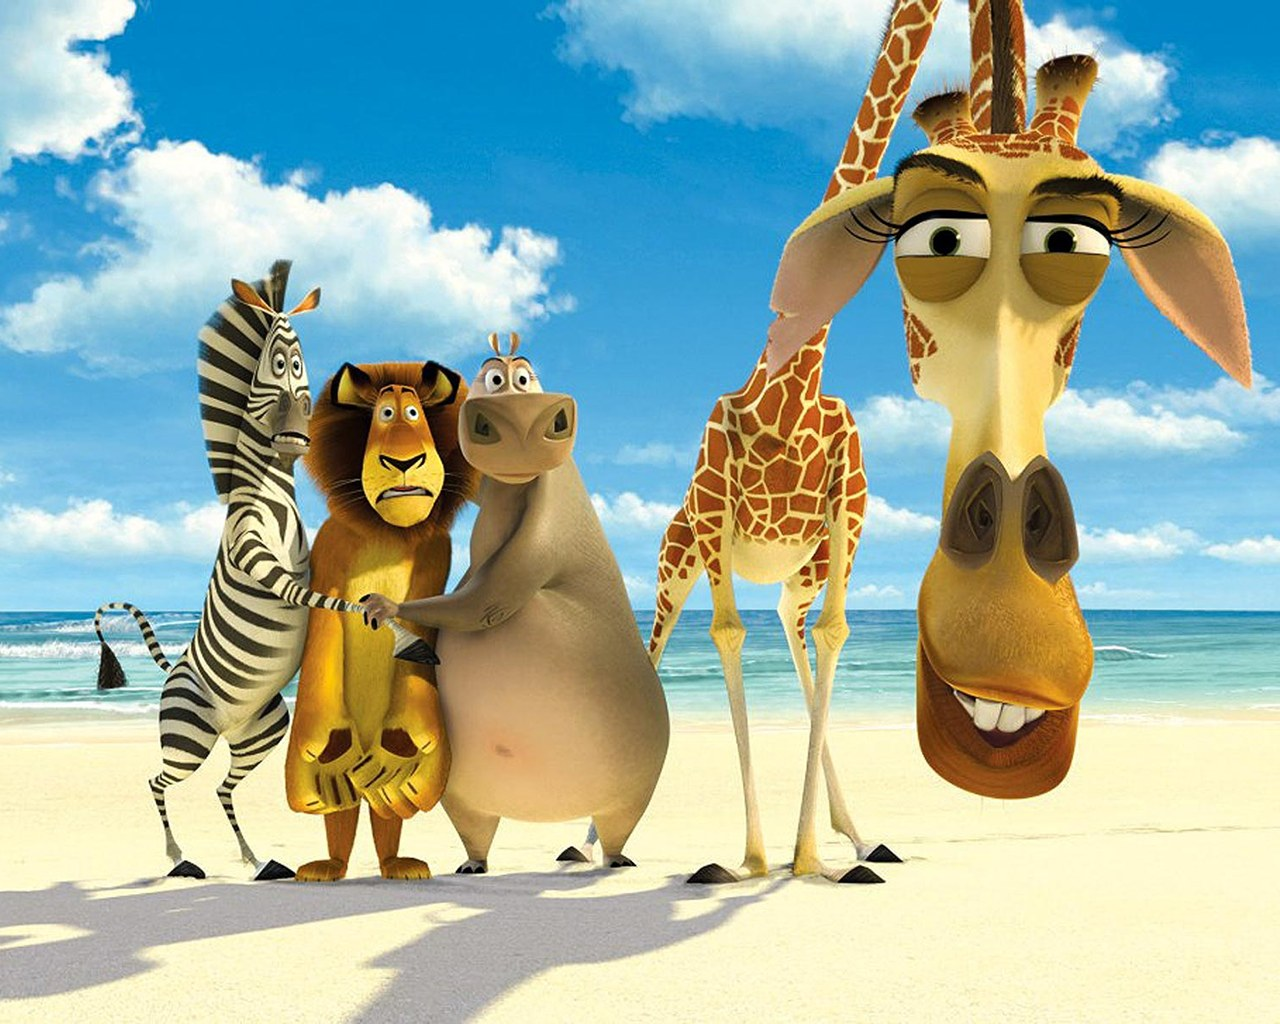 """Madagascar"" desktop wallpaper number 2 (1280 x 1024 pixels)"